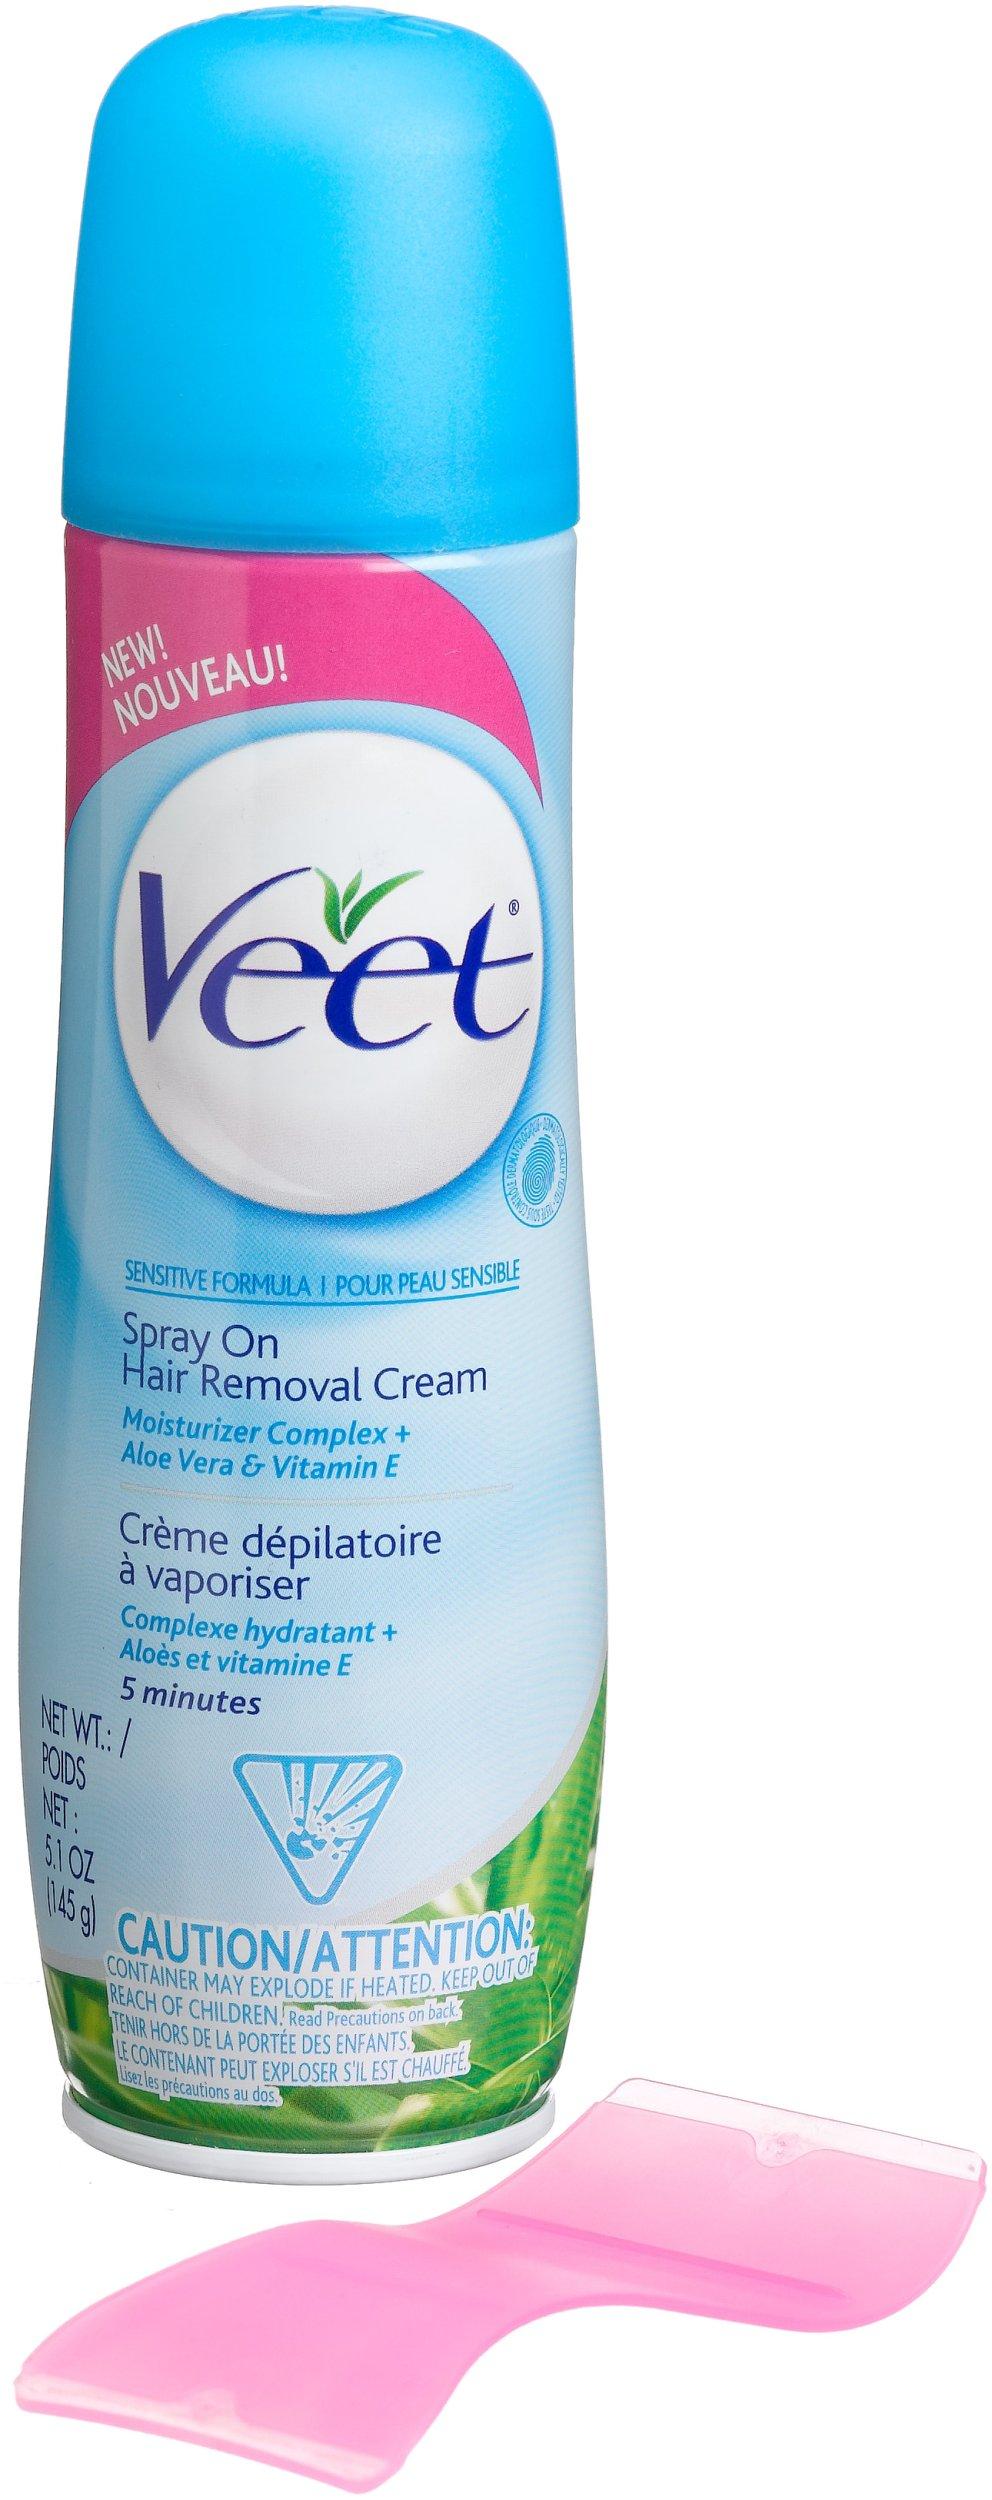 Veet Spray On Hair Removal Cream, Sensitive Formula, Aloe Vera & Vitamin E, 5.1-Ounce Spray Bottles (Pack of 4) by Veet